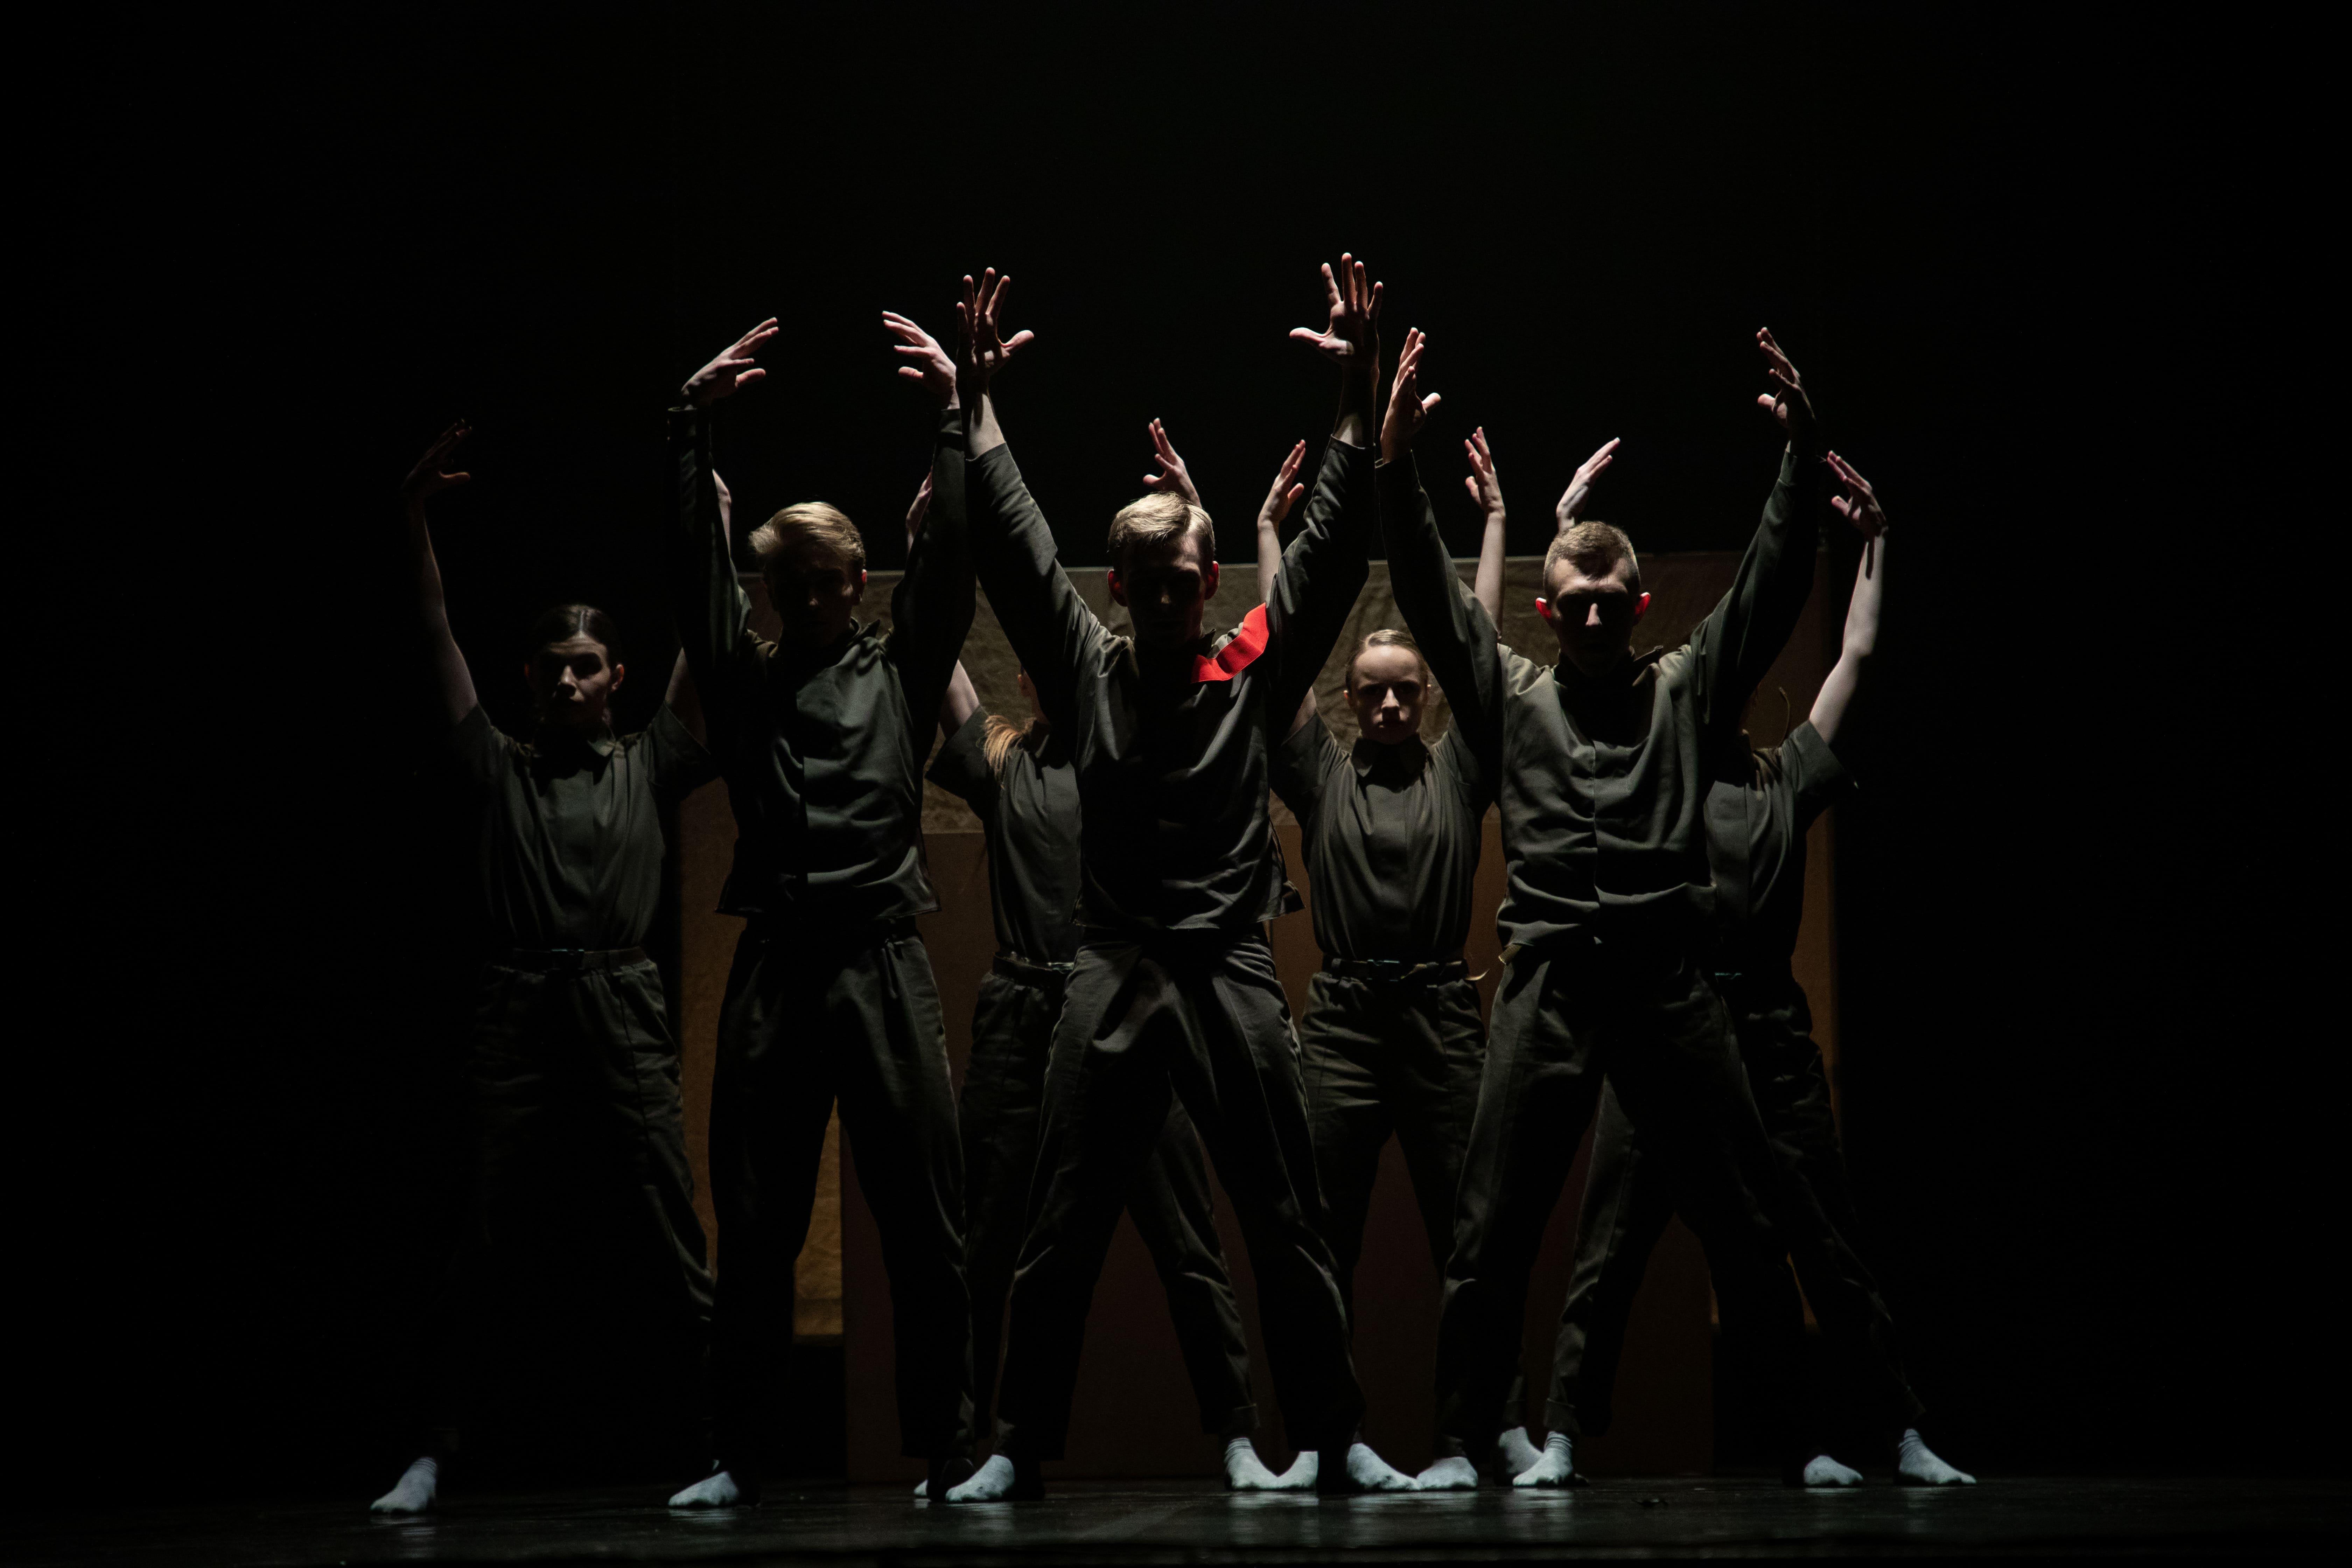 ТЕАТР Kyiv Modern Ballet. Ближе, чем любовь, 1984. Другая-1